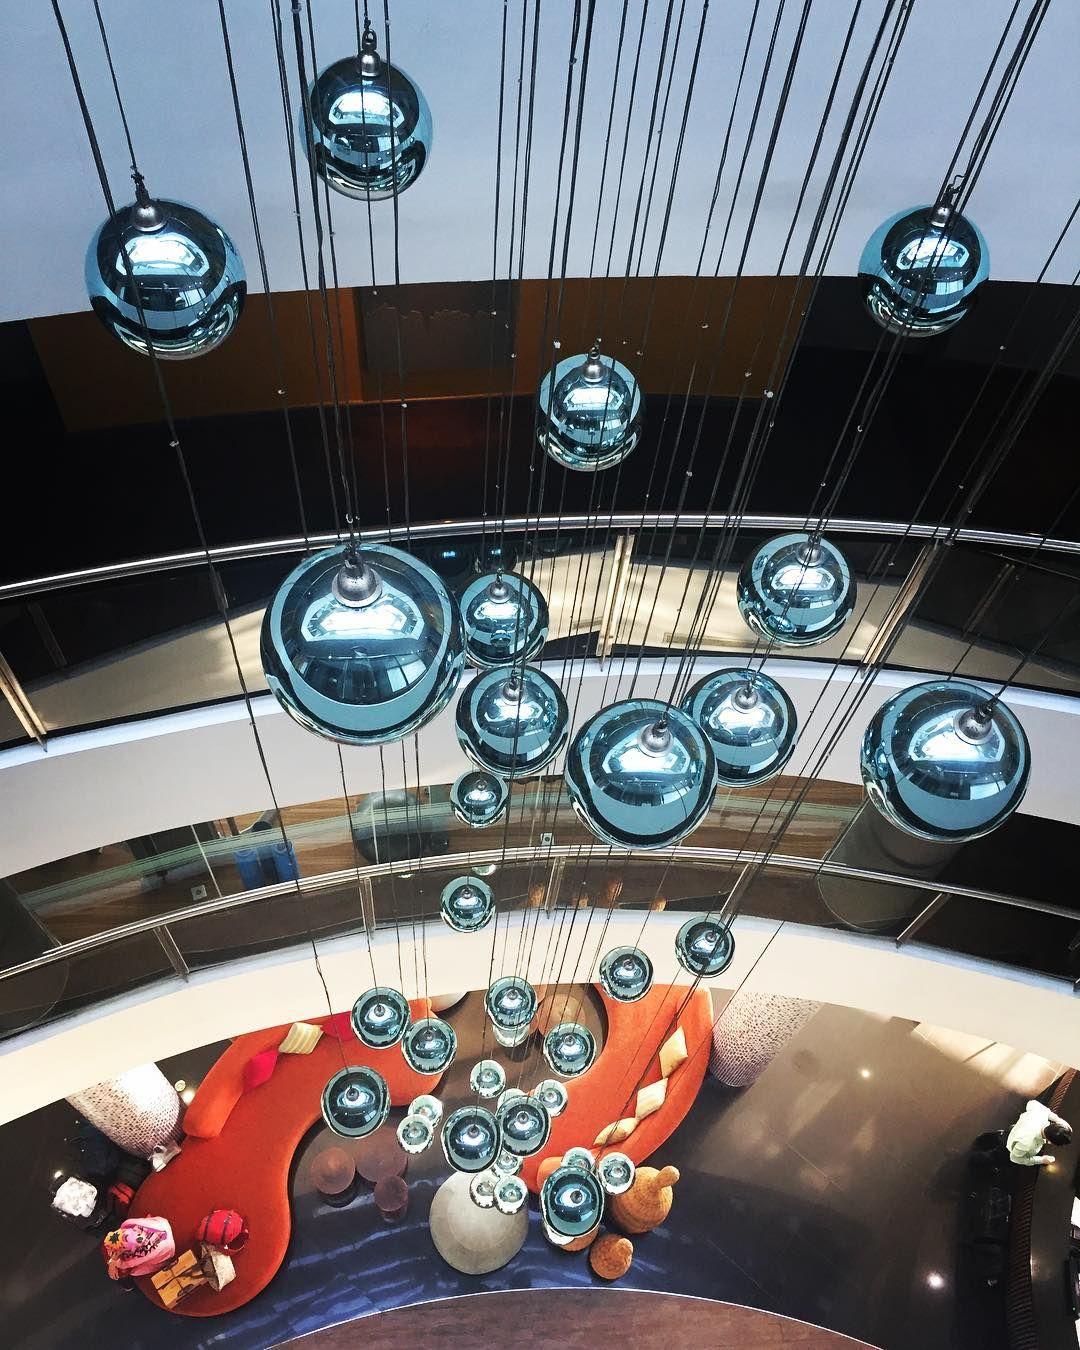 Christmas Hotel Last Hours At Indonesia Deco Ibisstyles Accorhotels Interiordesign